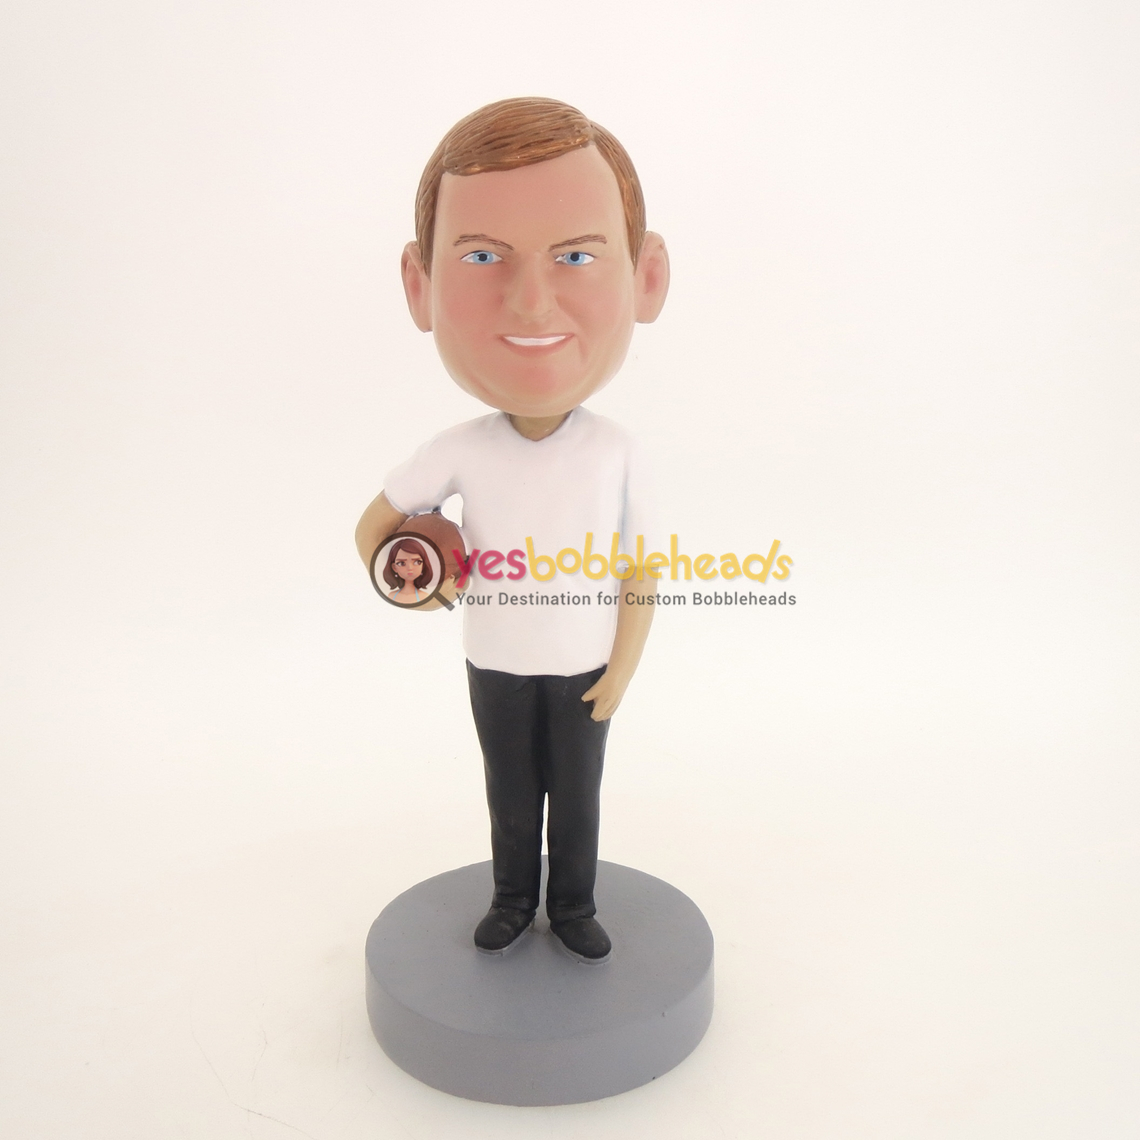 Picture of Custom Bobblehead Doll: Man Holding Football